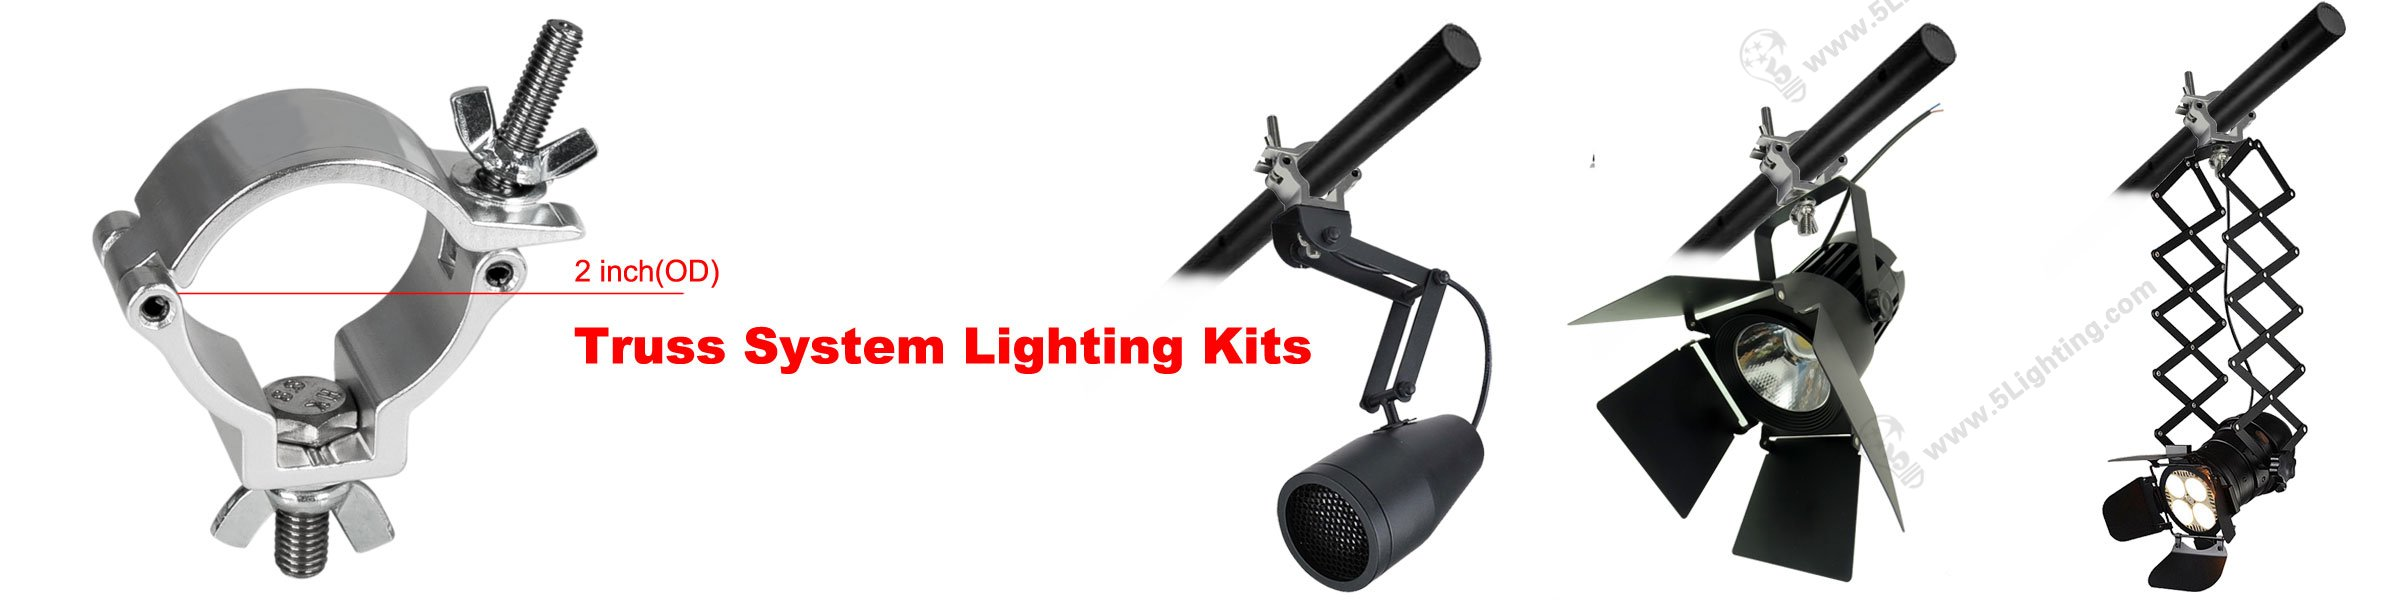 Truss system lighting kits